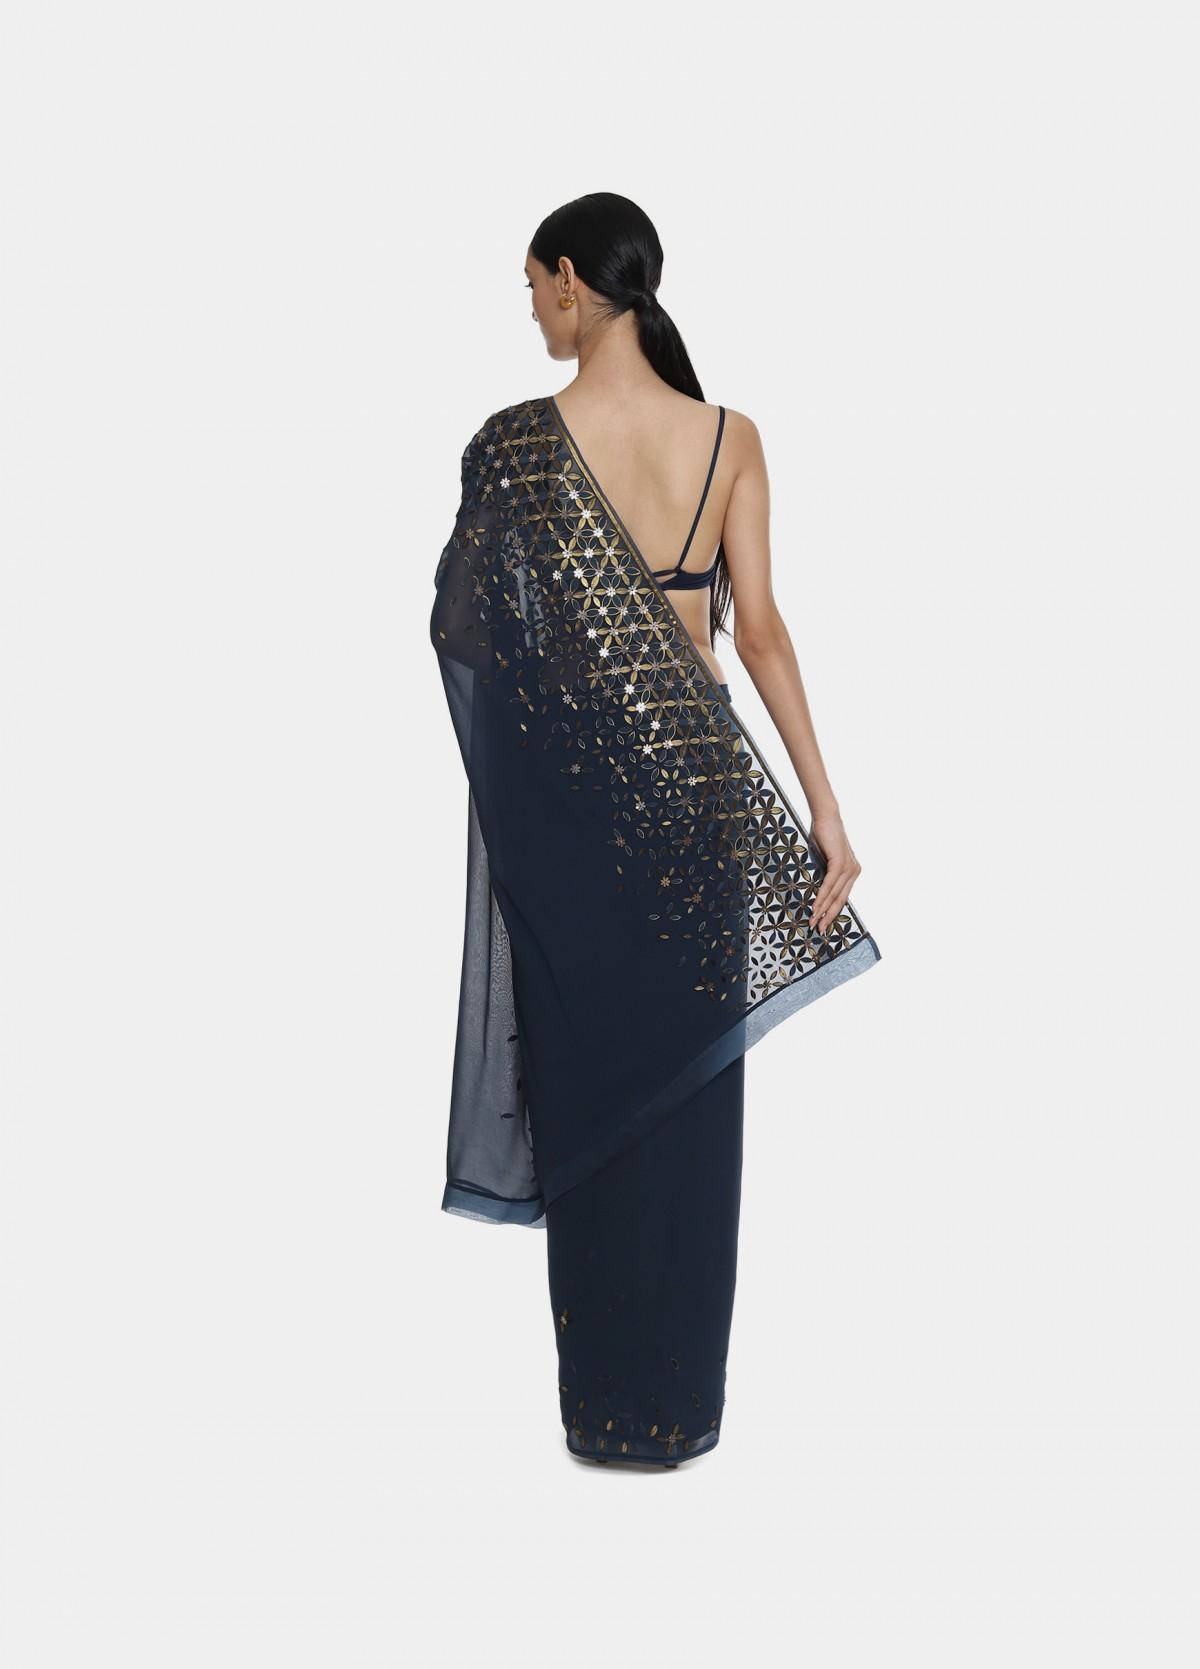 The Montage Sari